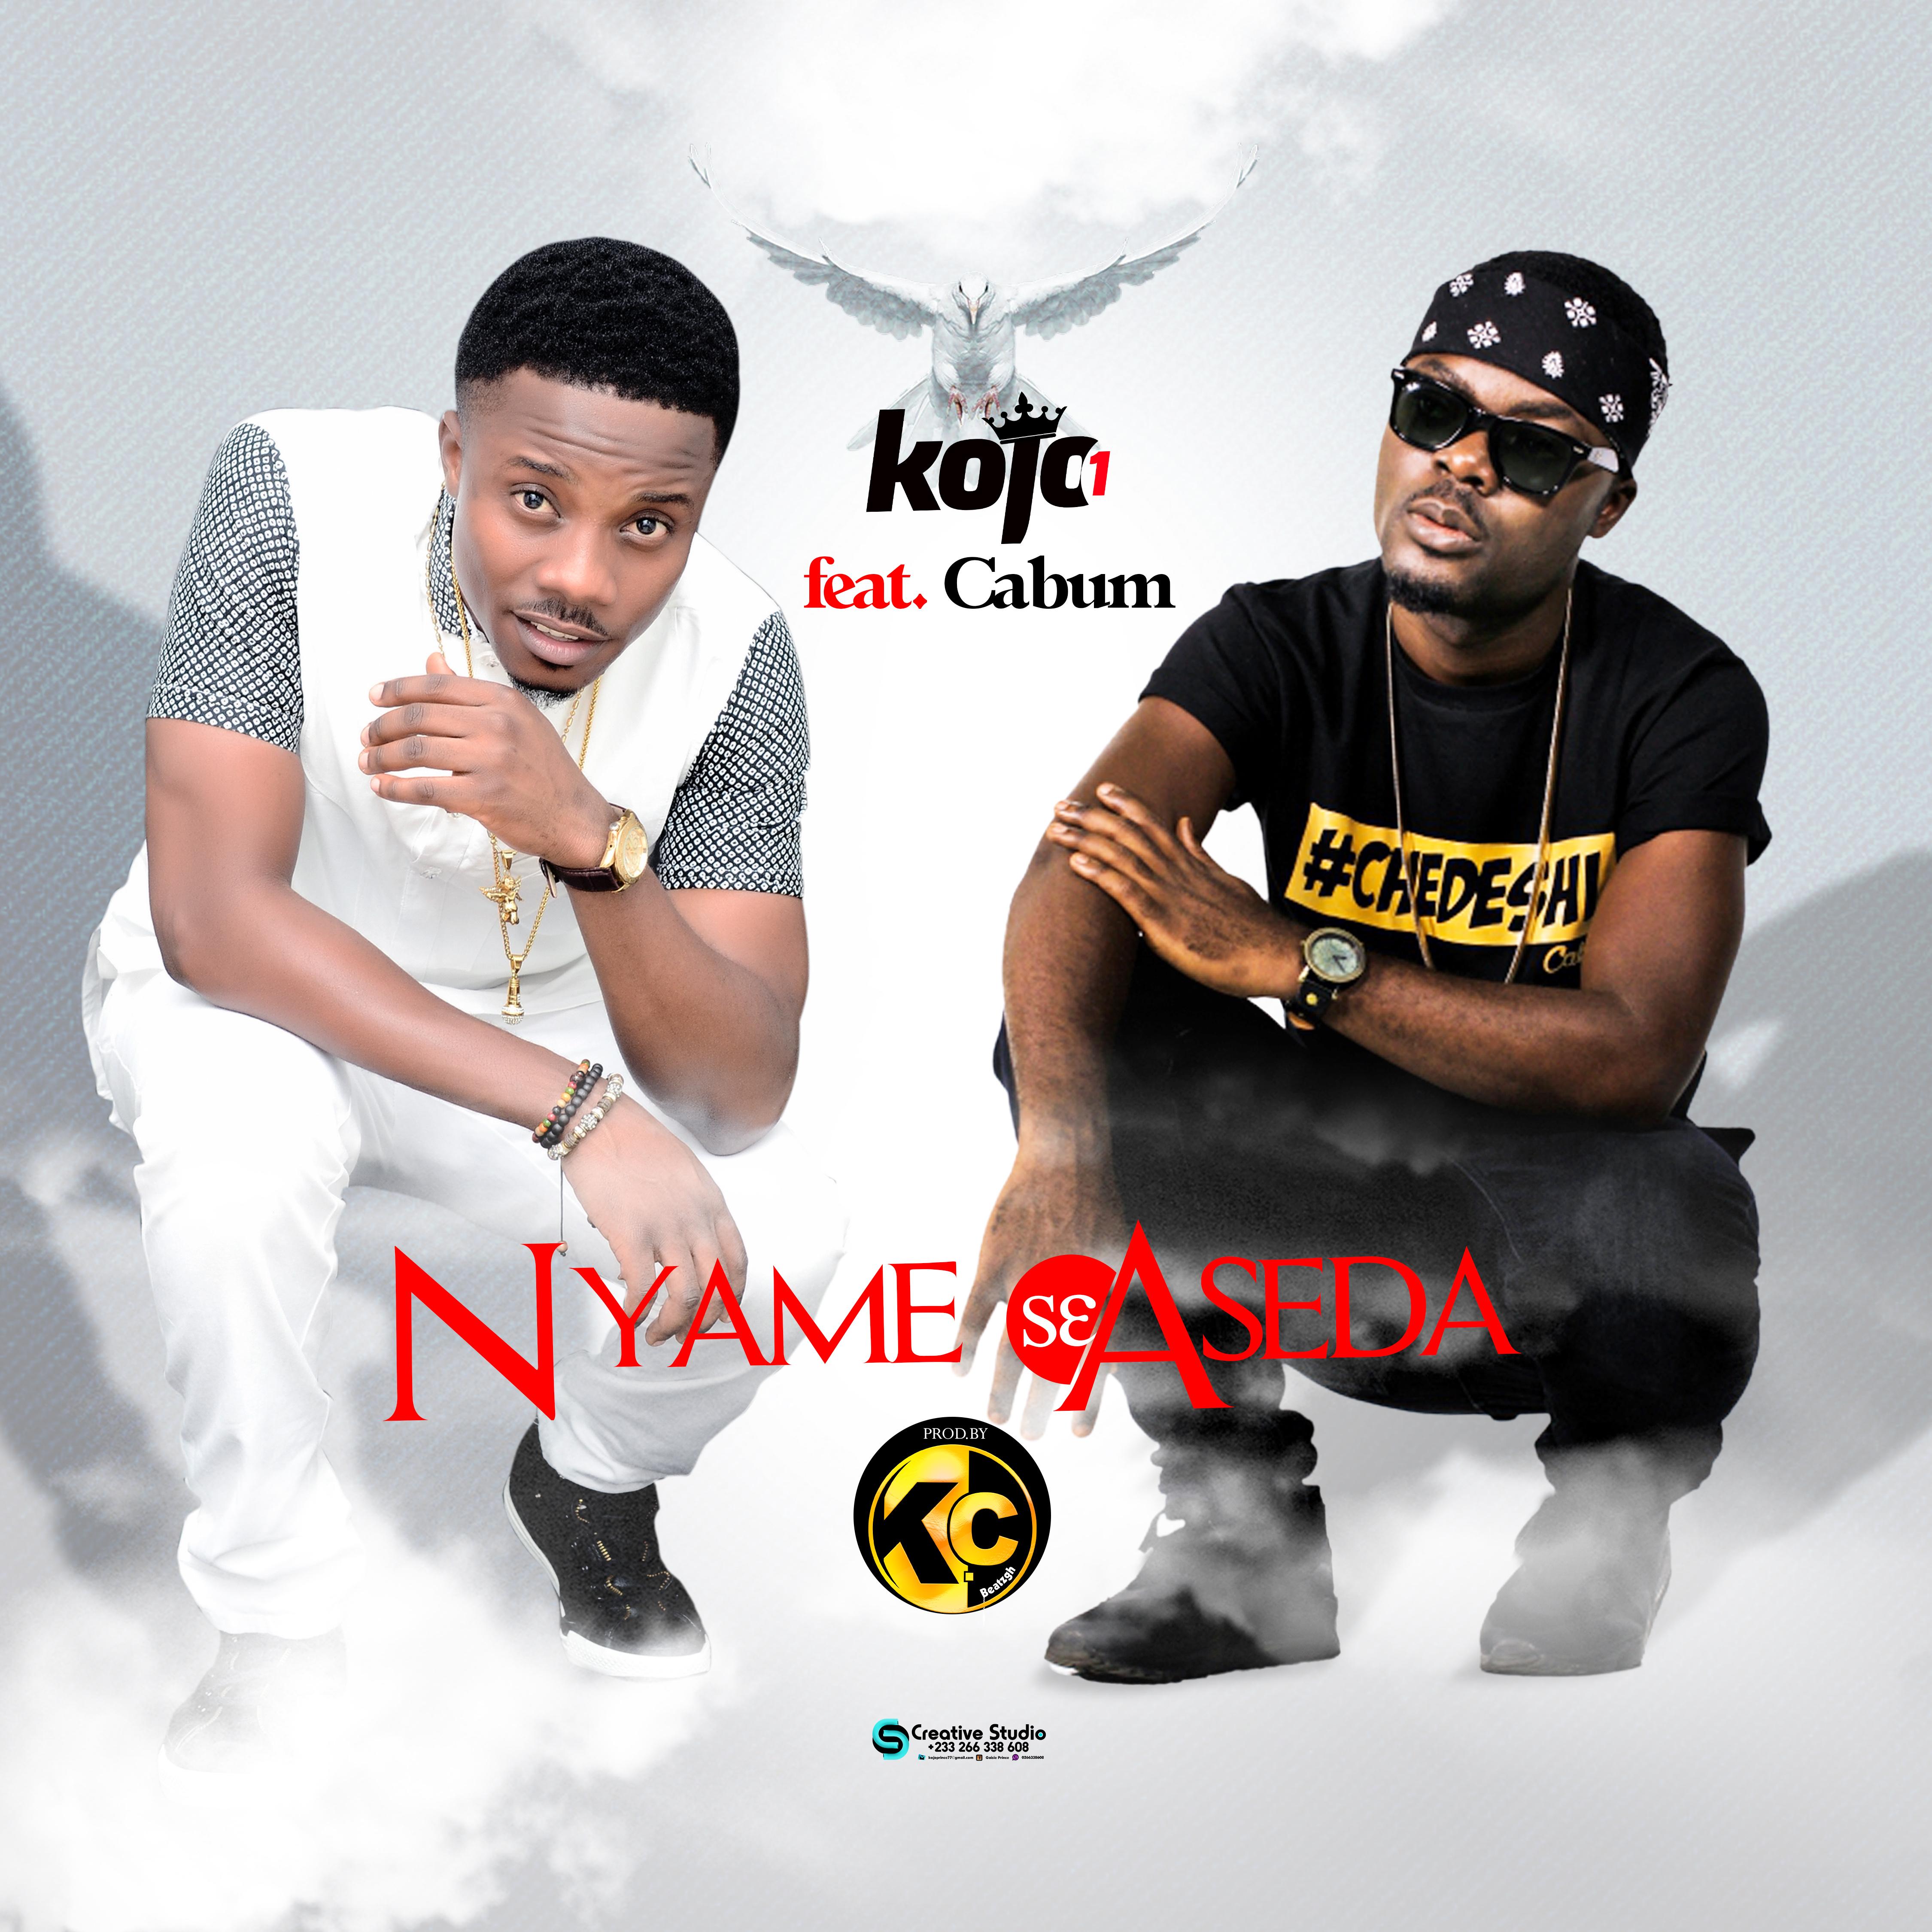 Kojo1 Feat. Cabum - Nyame s3 Aseda (Prod By K.c beatz)